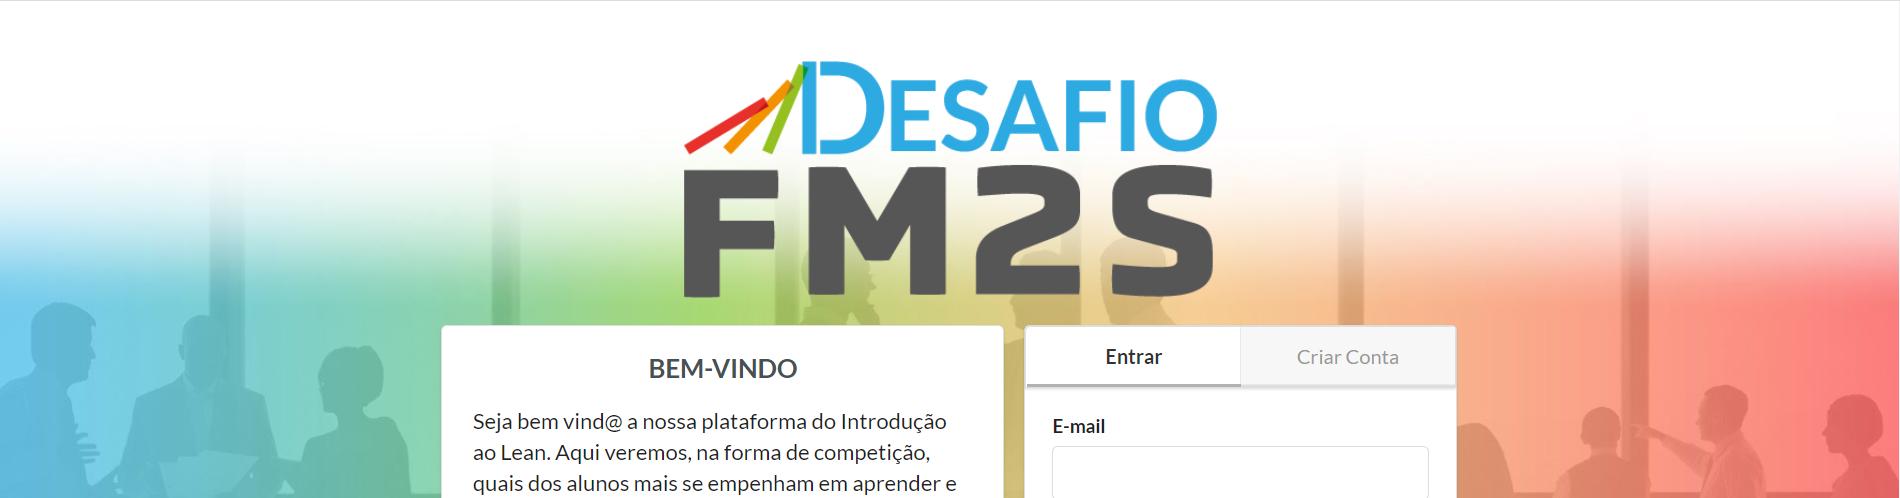 blogdesafio1